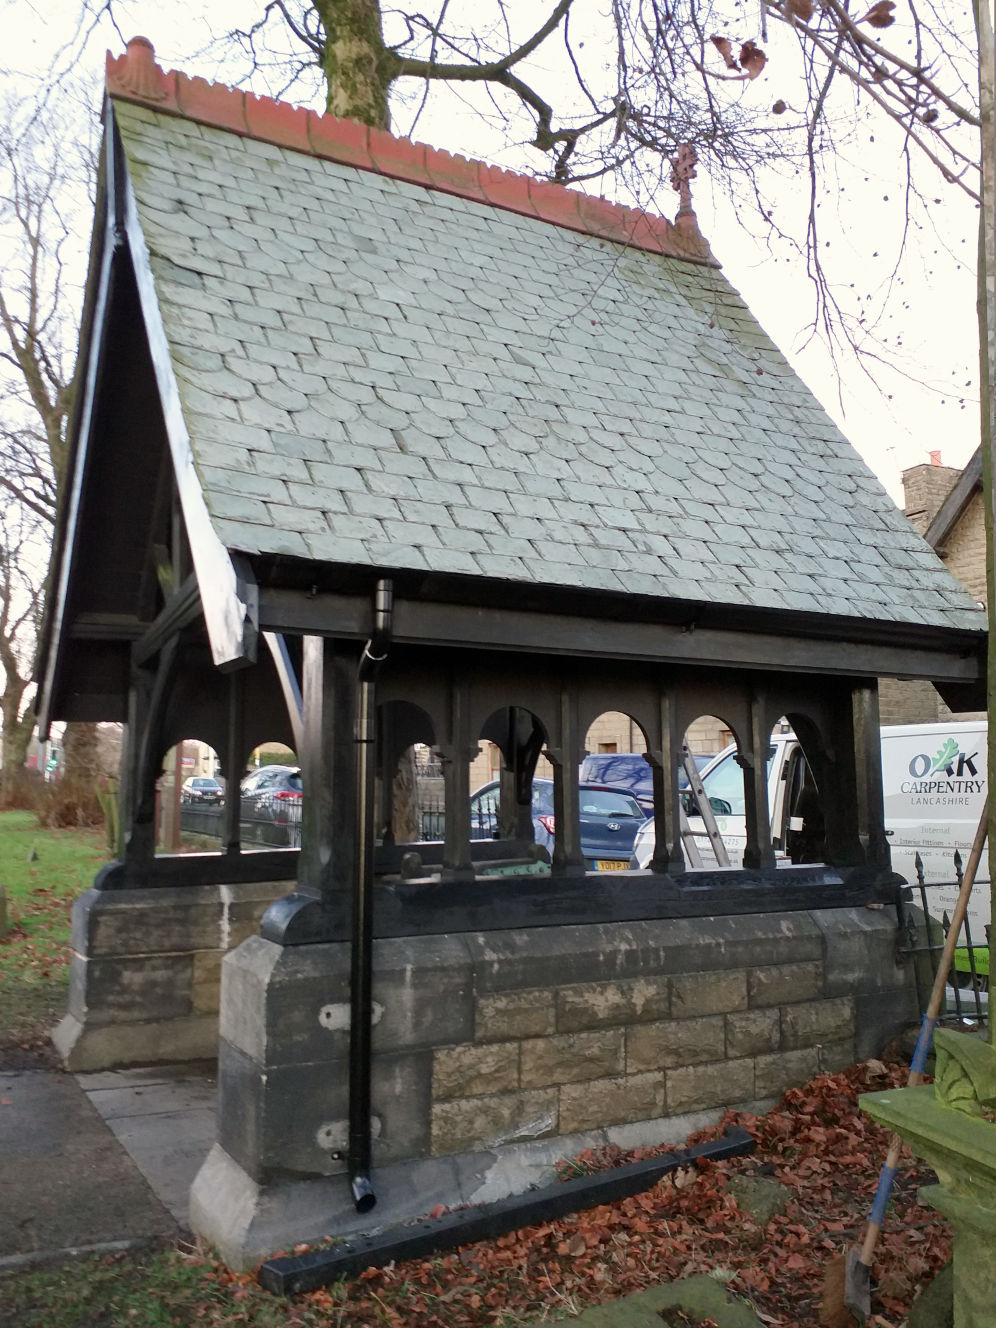 Lychgate refurbishment, Edenfield Church, structural repairs, new Aluminium gutters, Rossendale, Lancashire